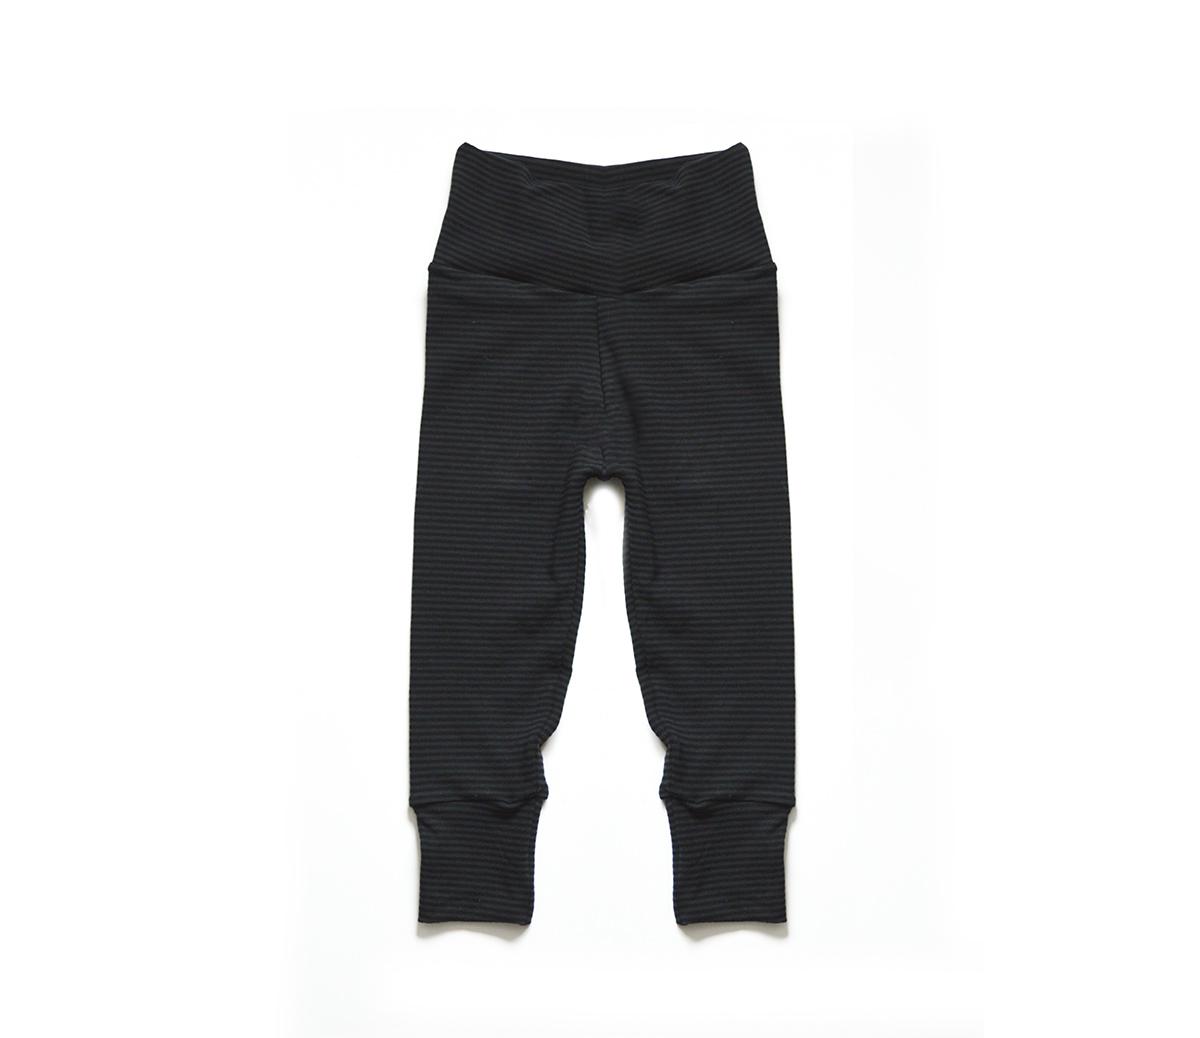 Little Sprout One-Size Pants™ Black & Charcoal Stripes - Cotton 00741